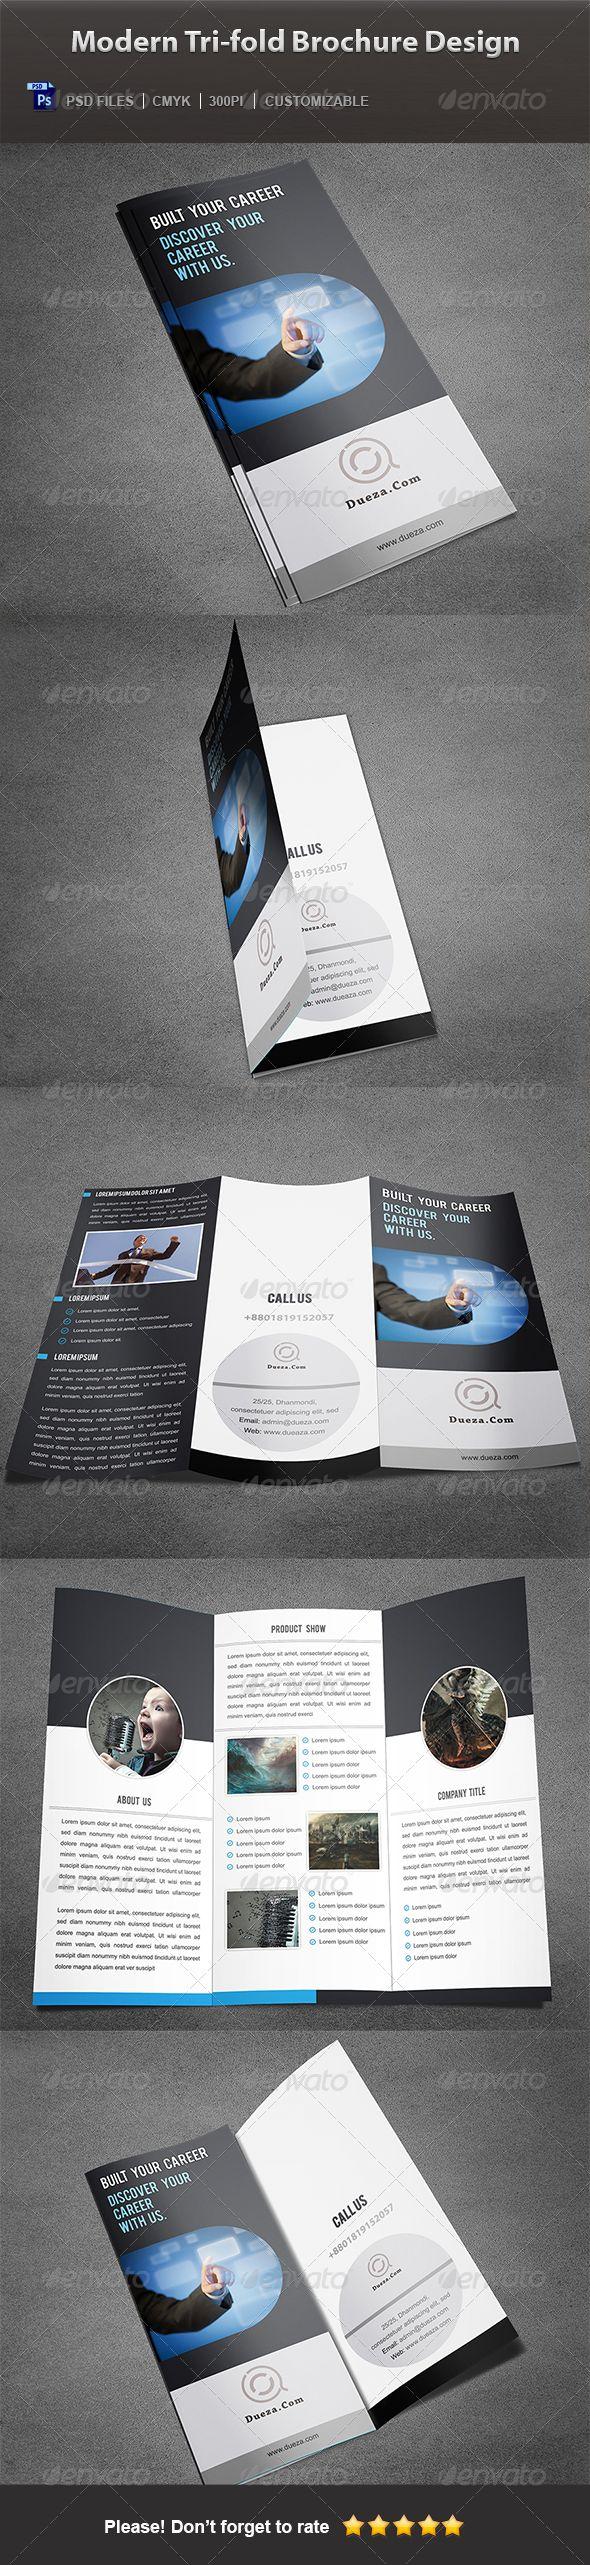 Creative Modern Corporate Brochure Design: Modern Tri-fold Brochure Design